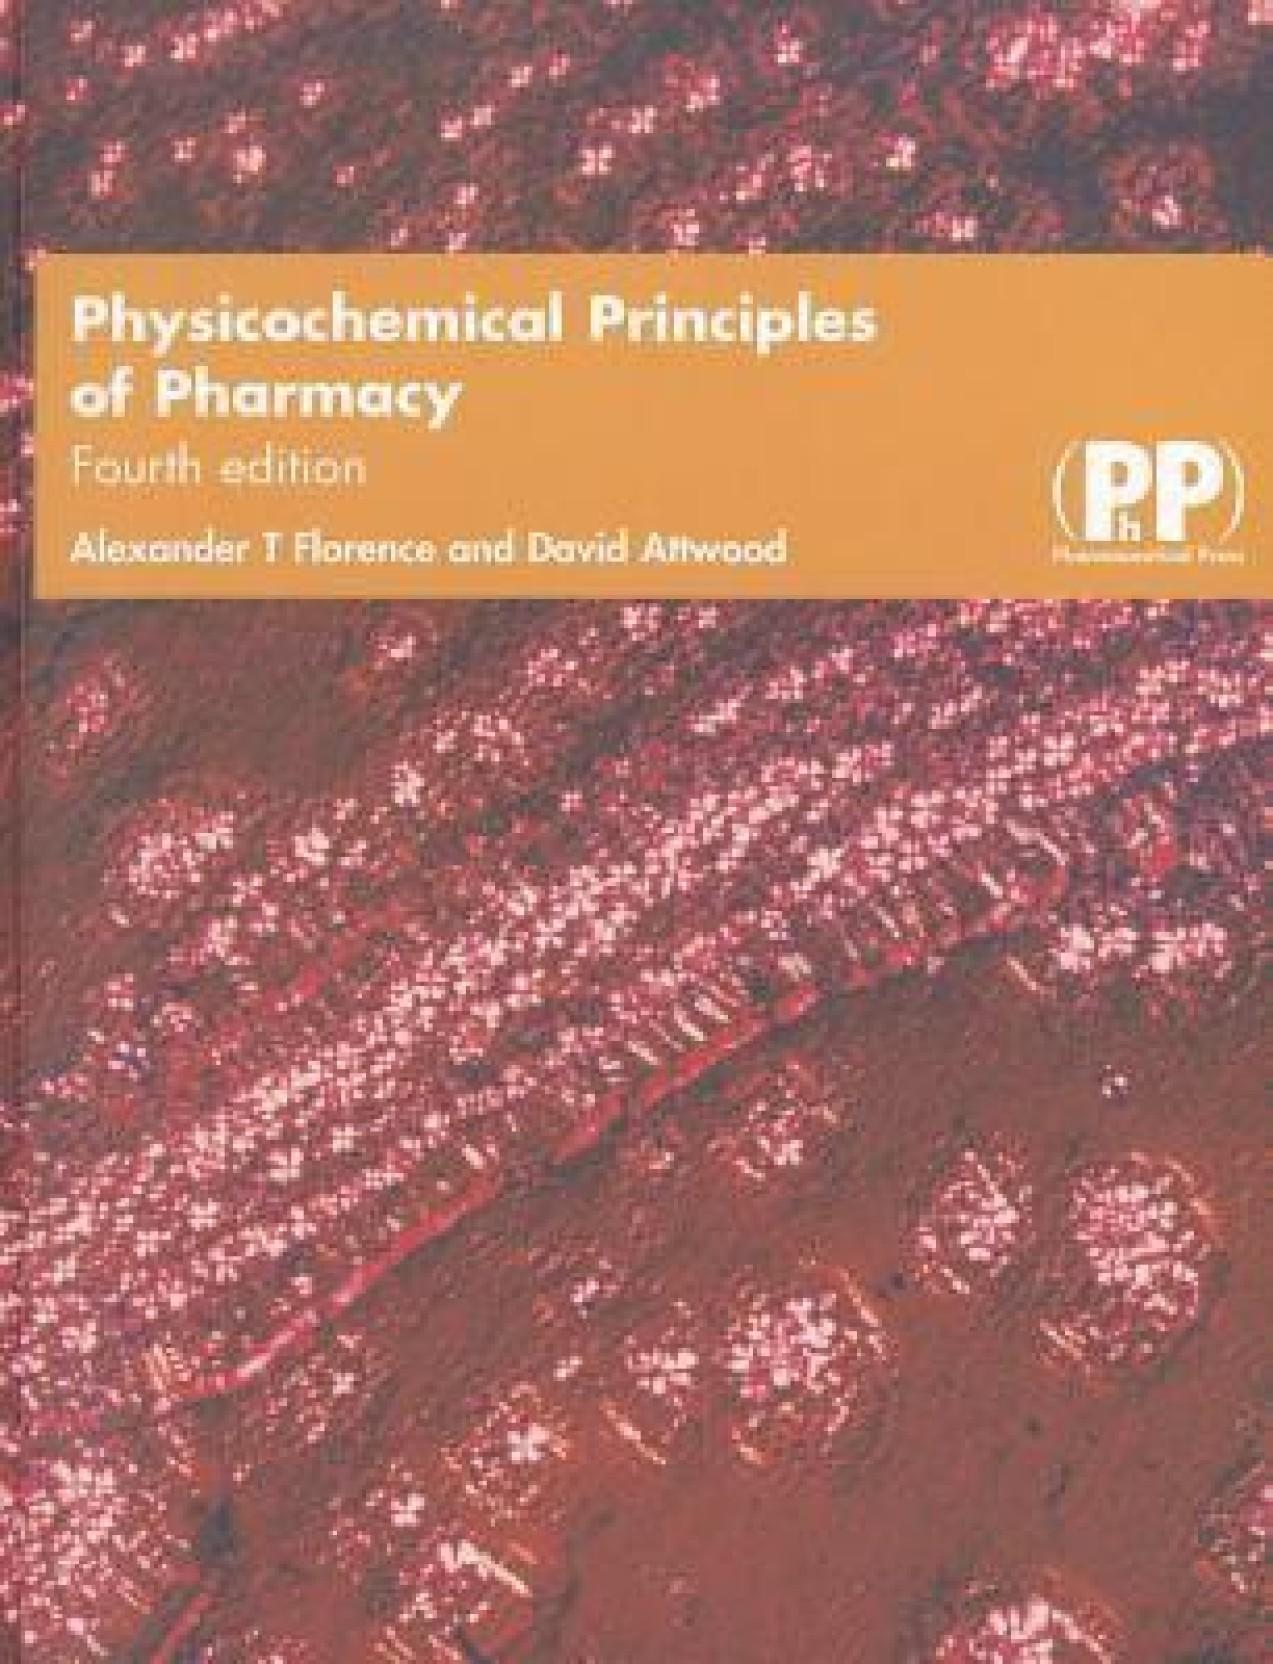 Florence alexander physicochemical principles pharmacy abebooks.